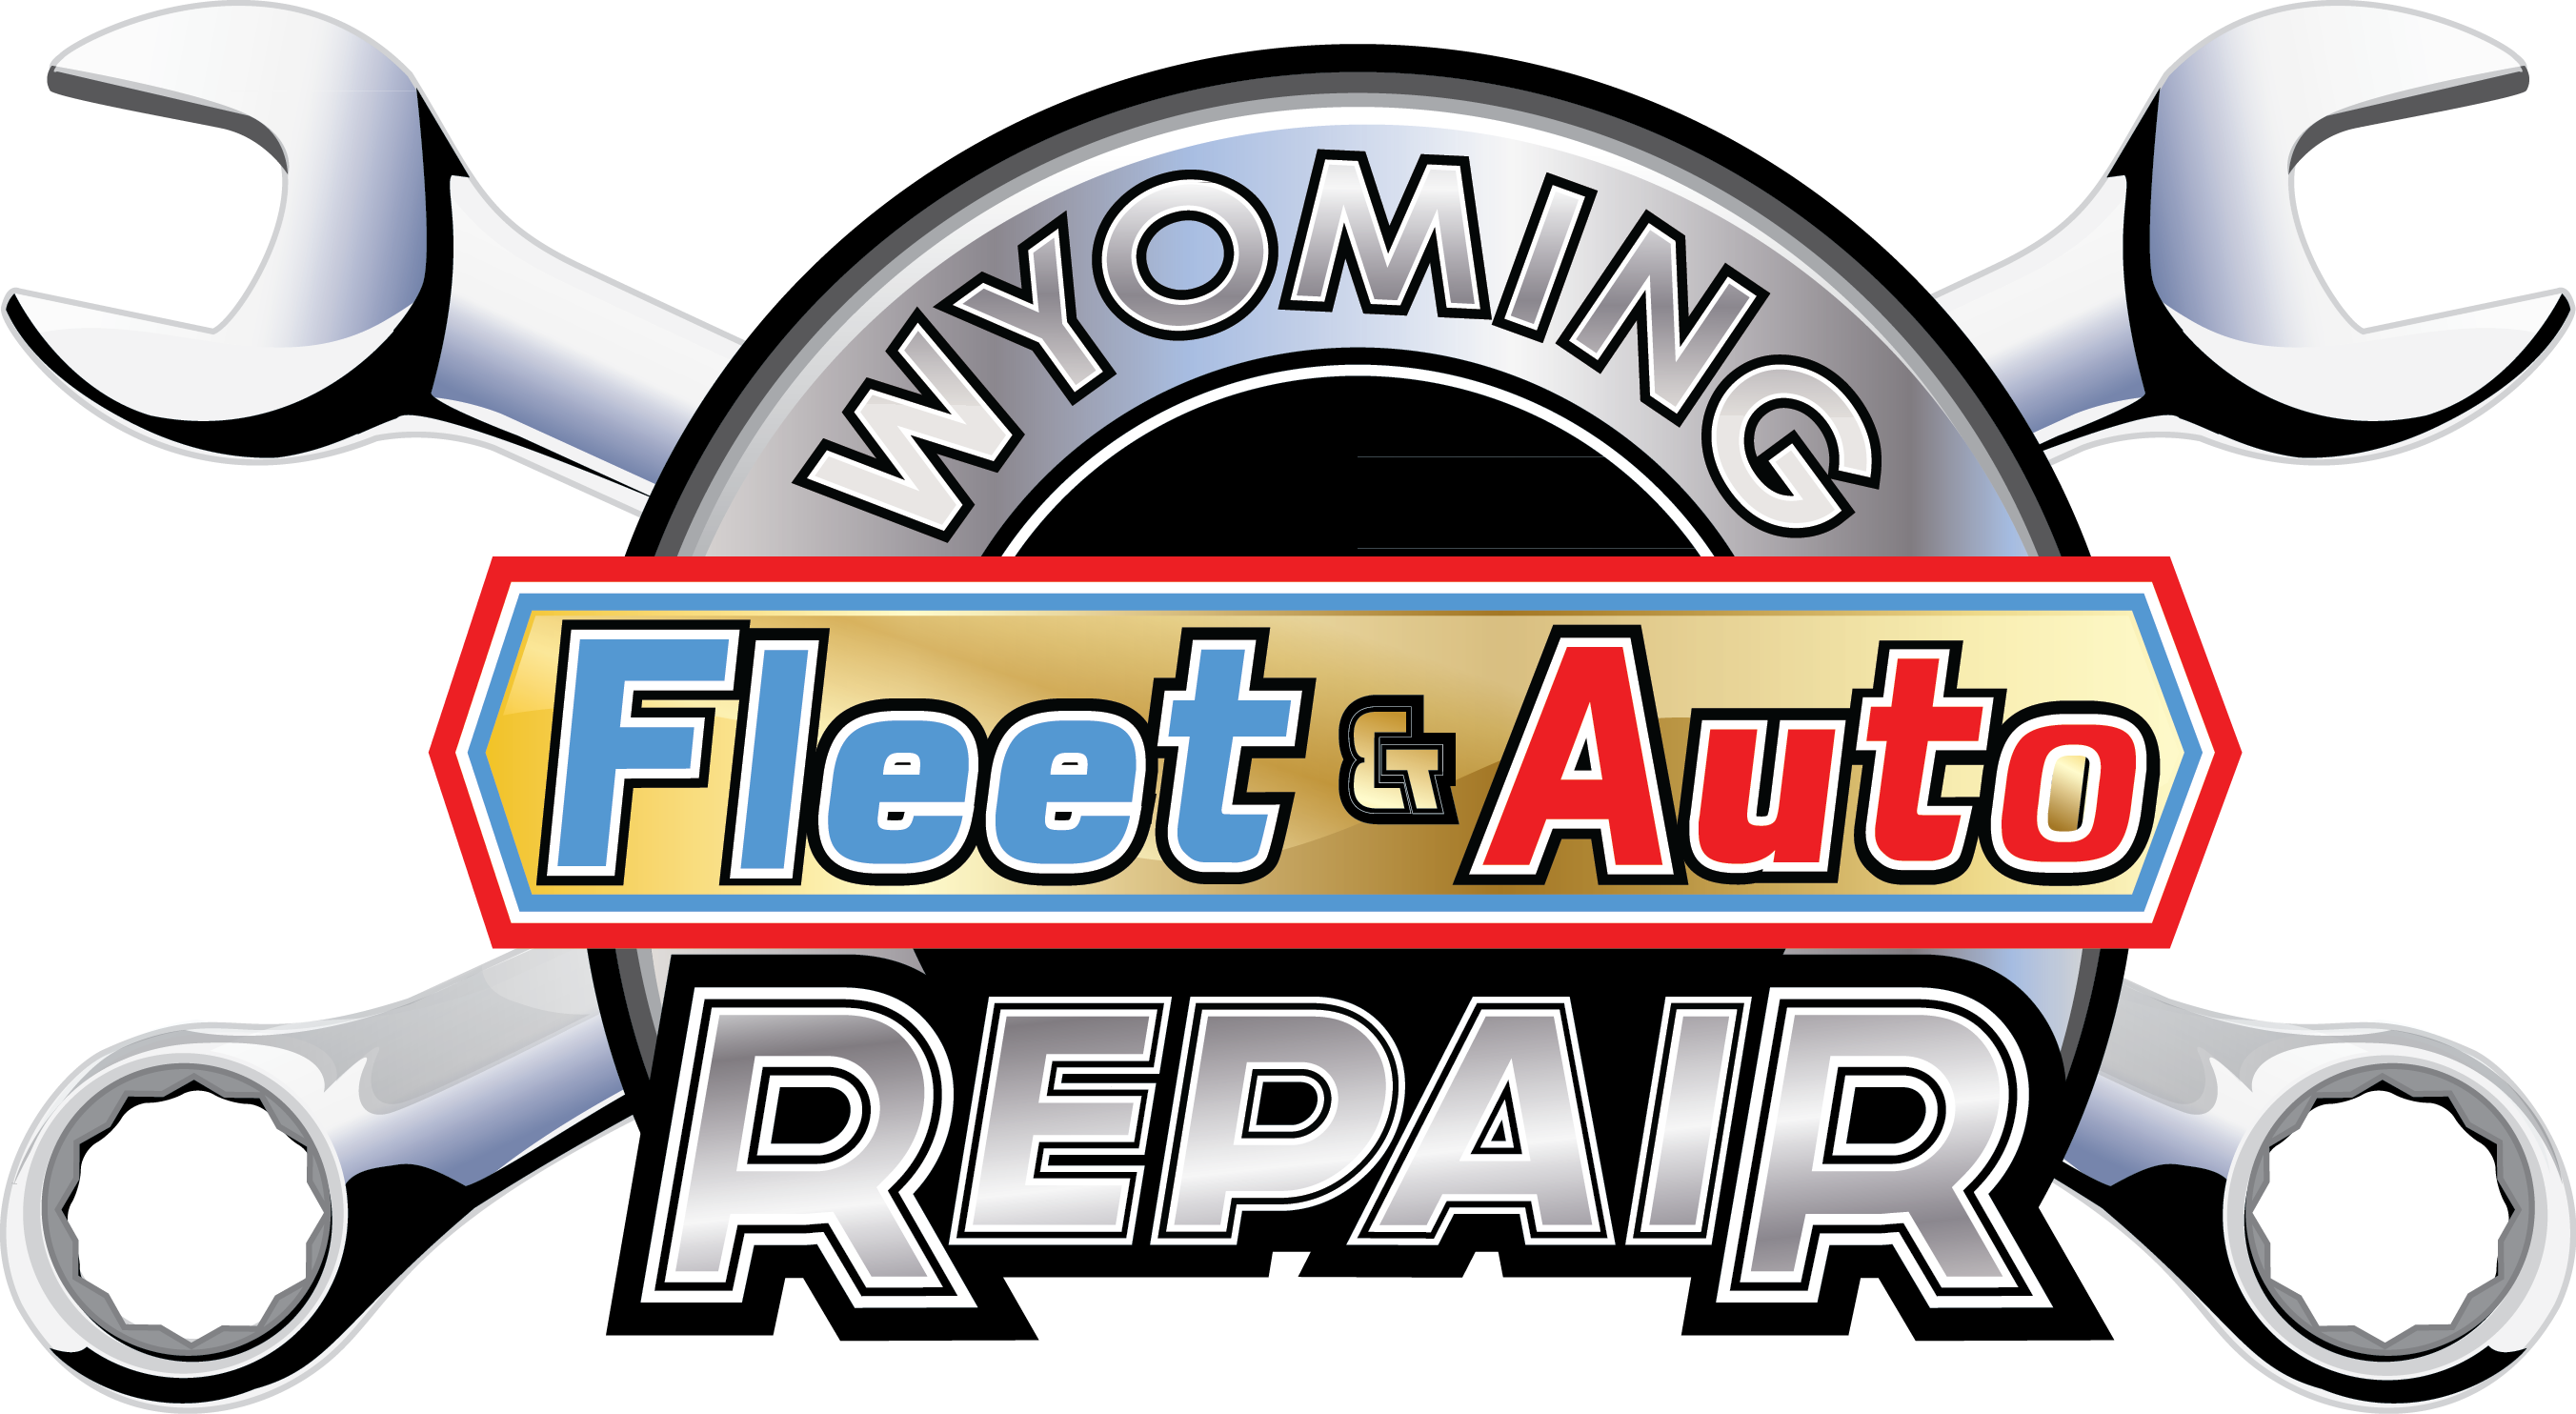 Car repair shop clipart banner freeuse Wyoming Fleet & Auto Repair banner freeuse